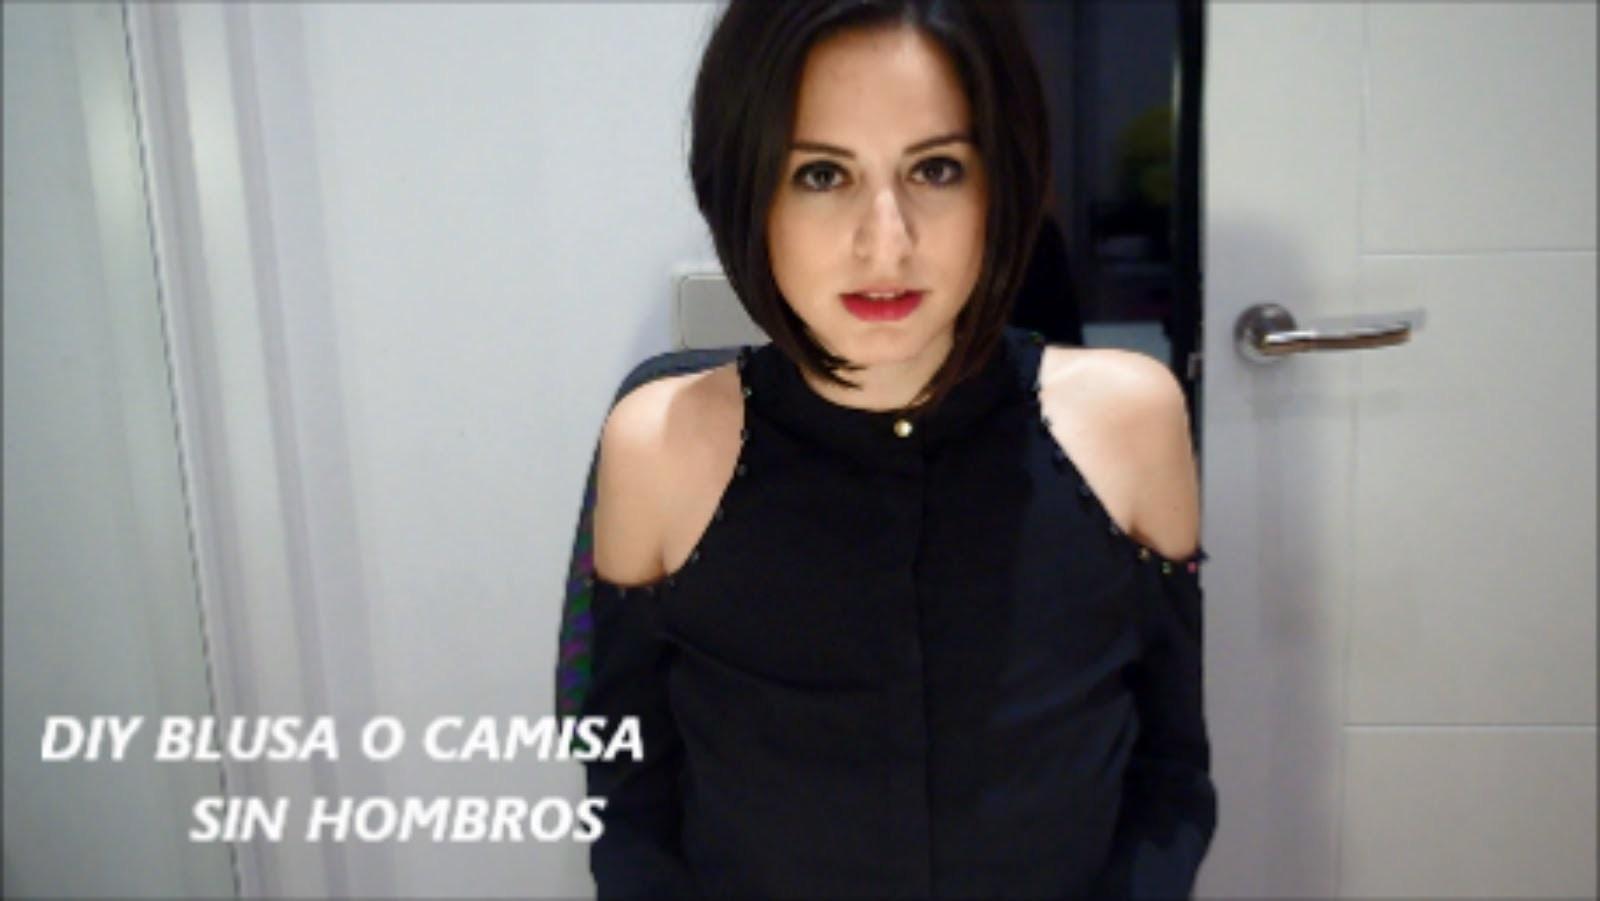 DIY BLUSA O CAMISA DECORADA SIN HOMBROS